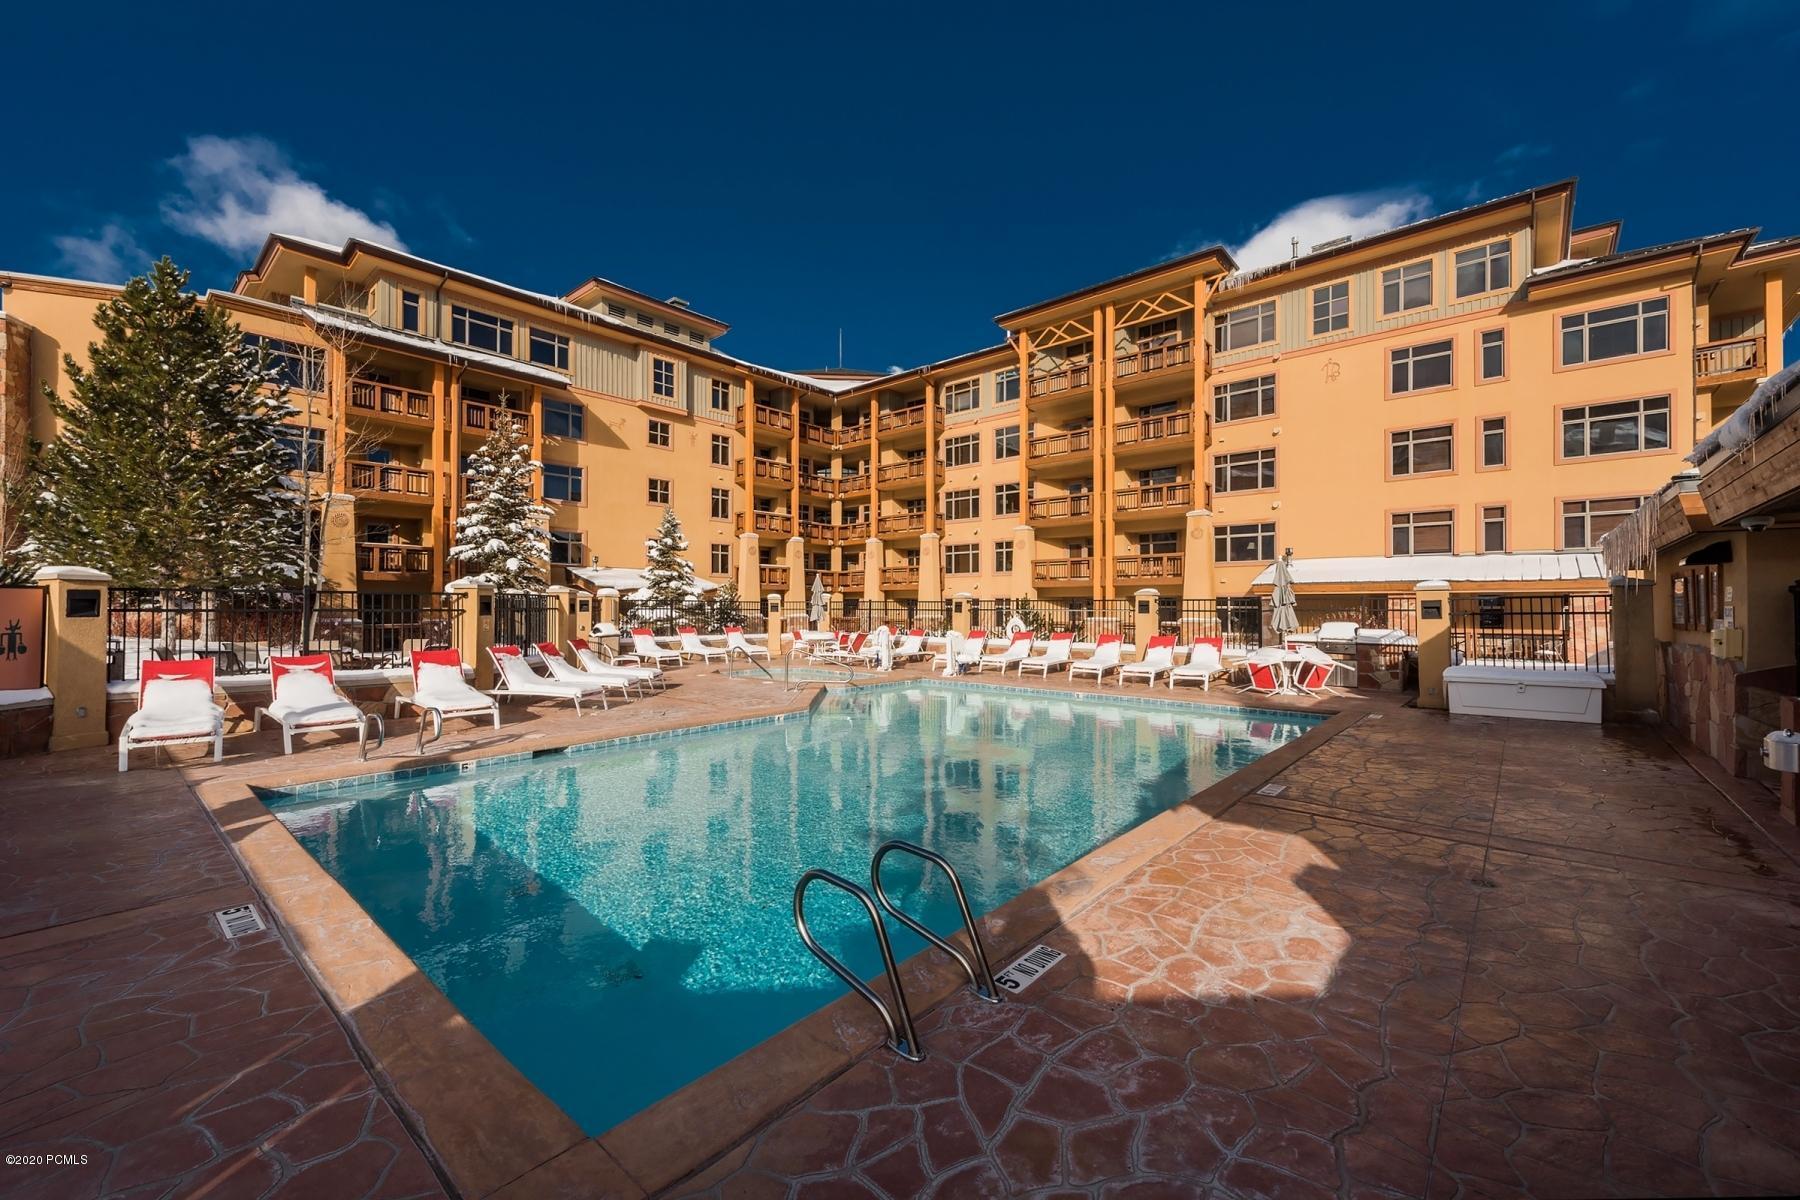 3720 Sundial Court, Park City, Utah 84098, 1 Bedroom Bedrooms, ,1 BathroomBathrooms,Condominium,For Sale,Sundial,12003587